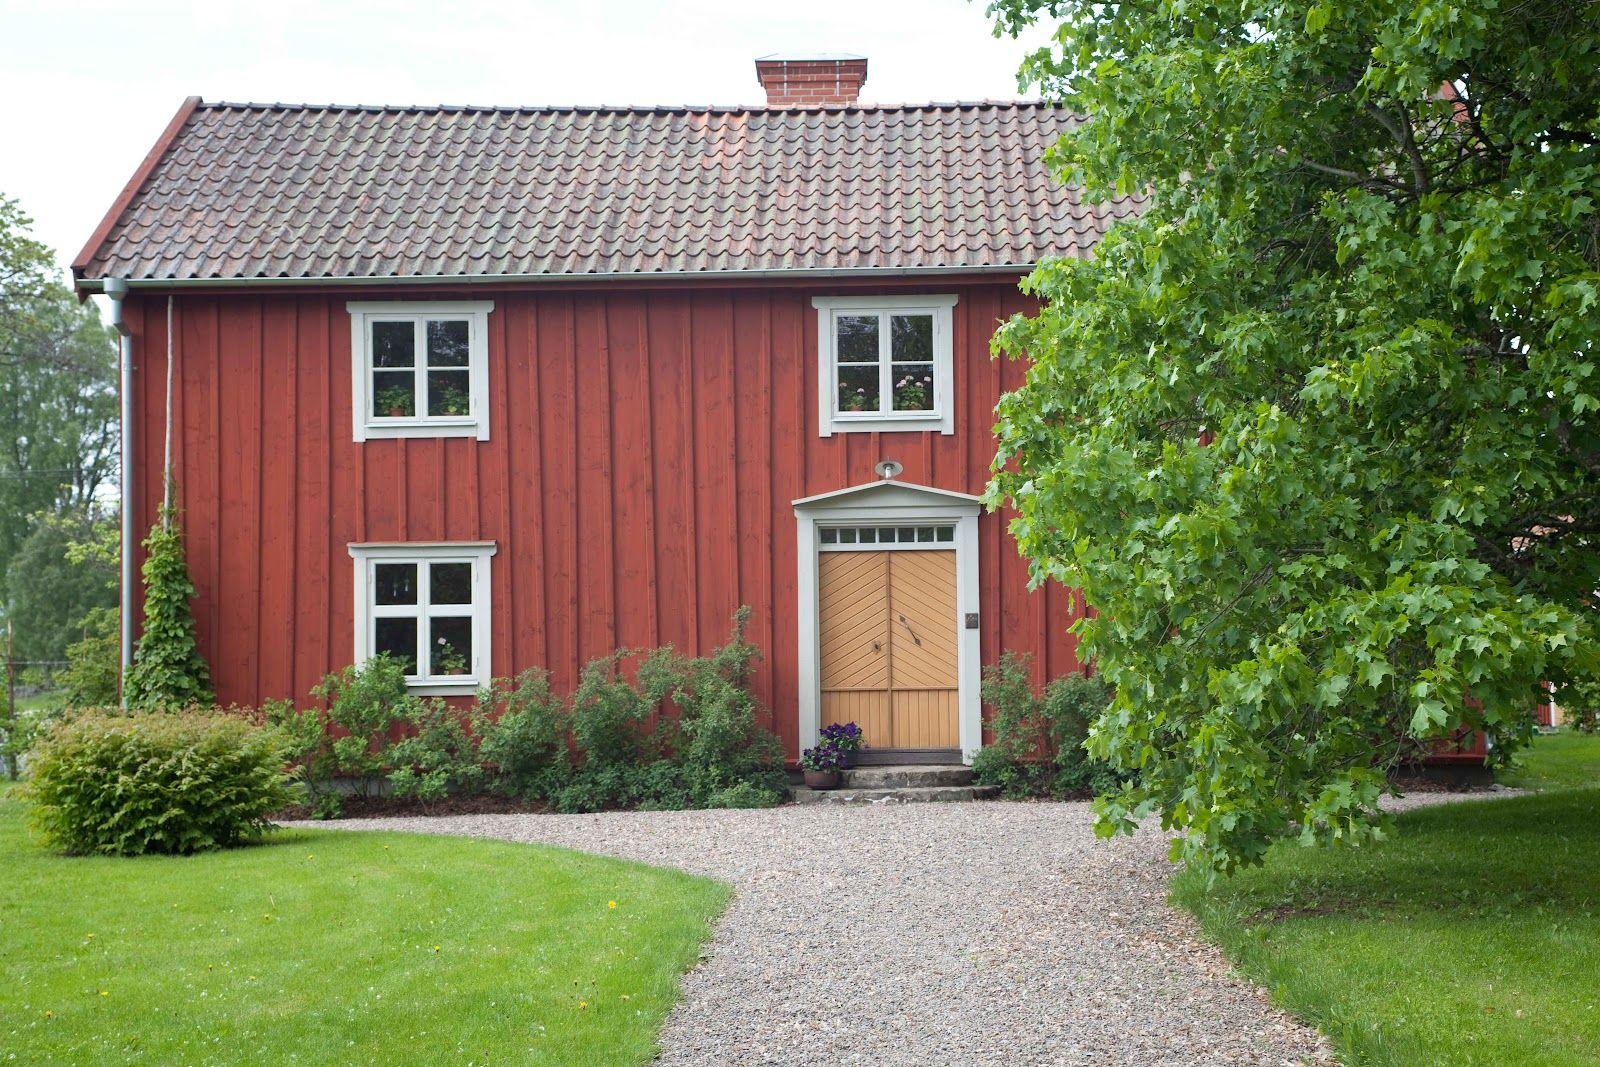 1000  images about byggnadsvård on pinterest